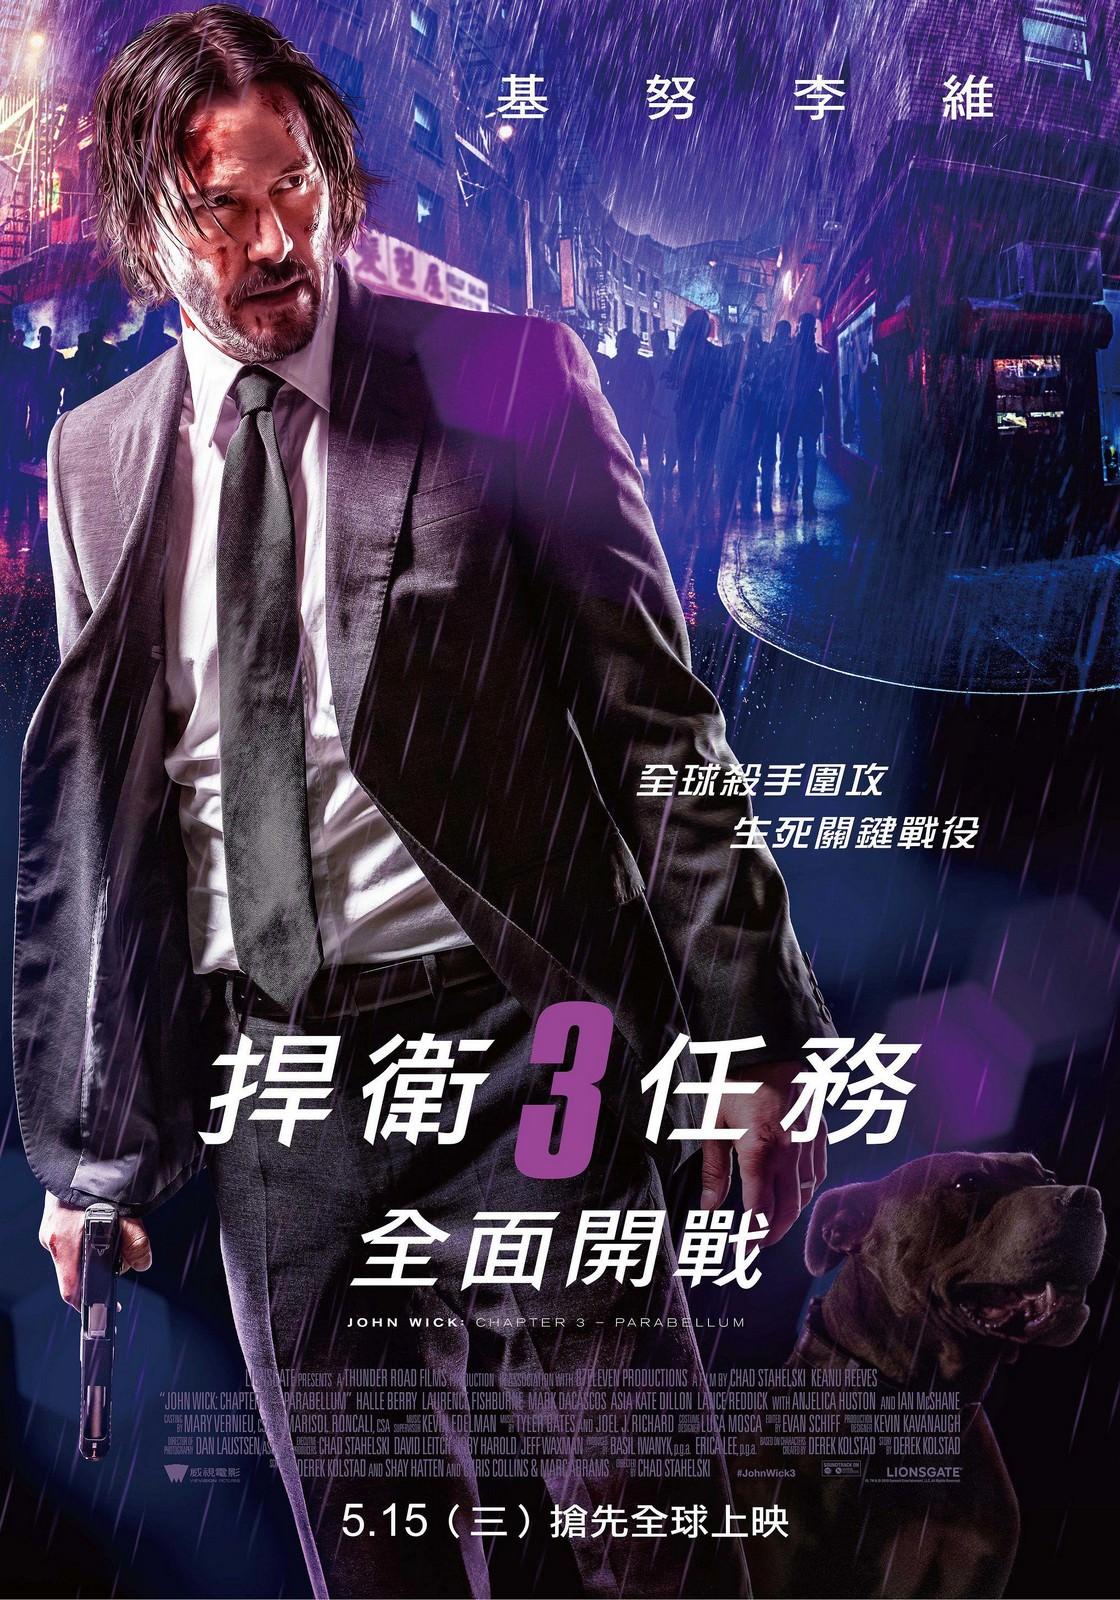 Movie, 捍衛任務3:全面開戰 / John Wick: Chapter 3 – Parabellum(美國, 2019年) / 殺神John Wick 3(香港) / 疾速备战(網路), 電影海報, 台灣